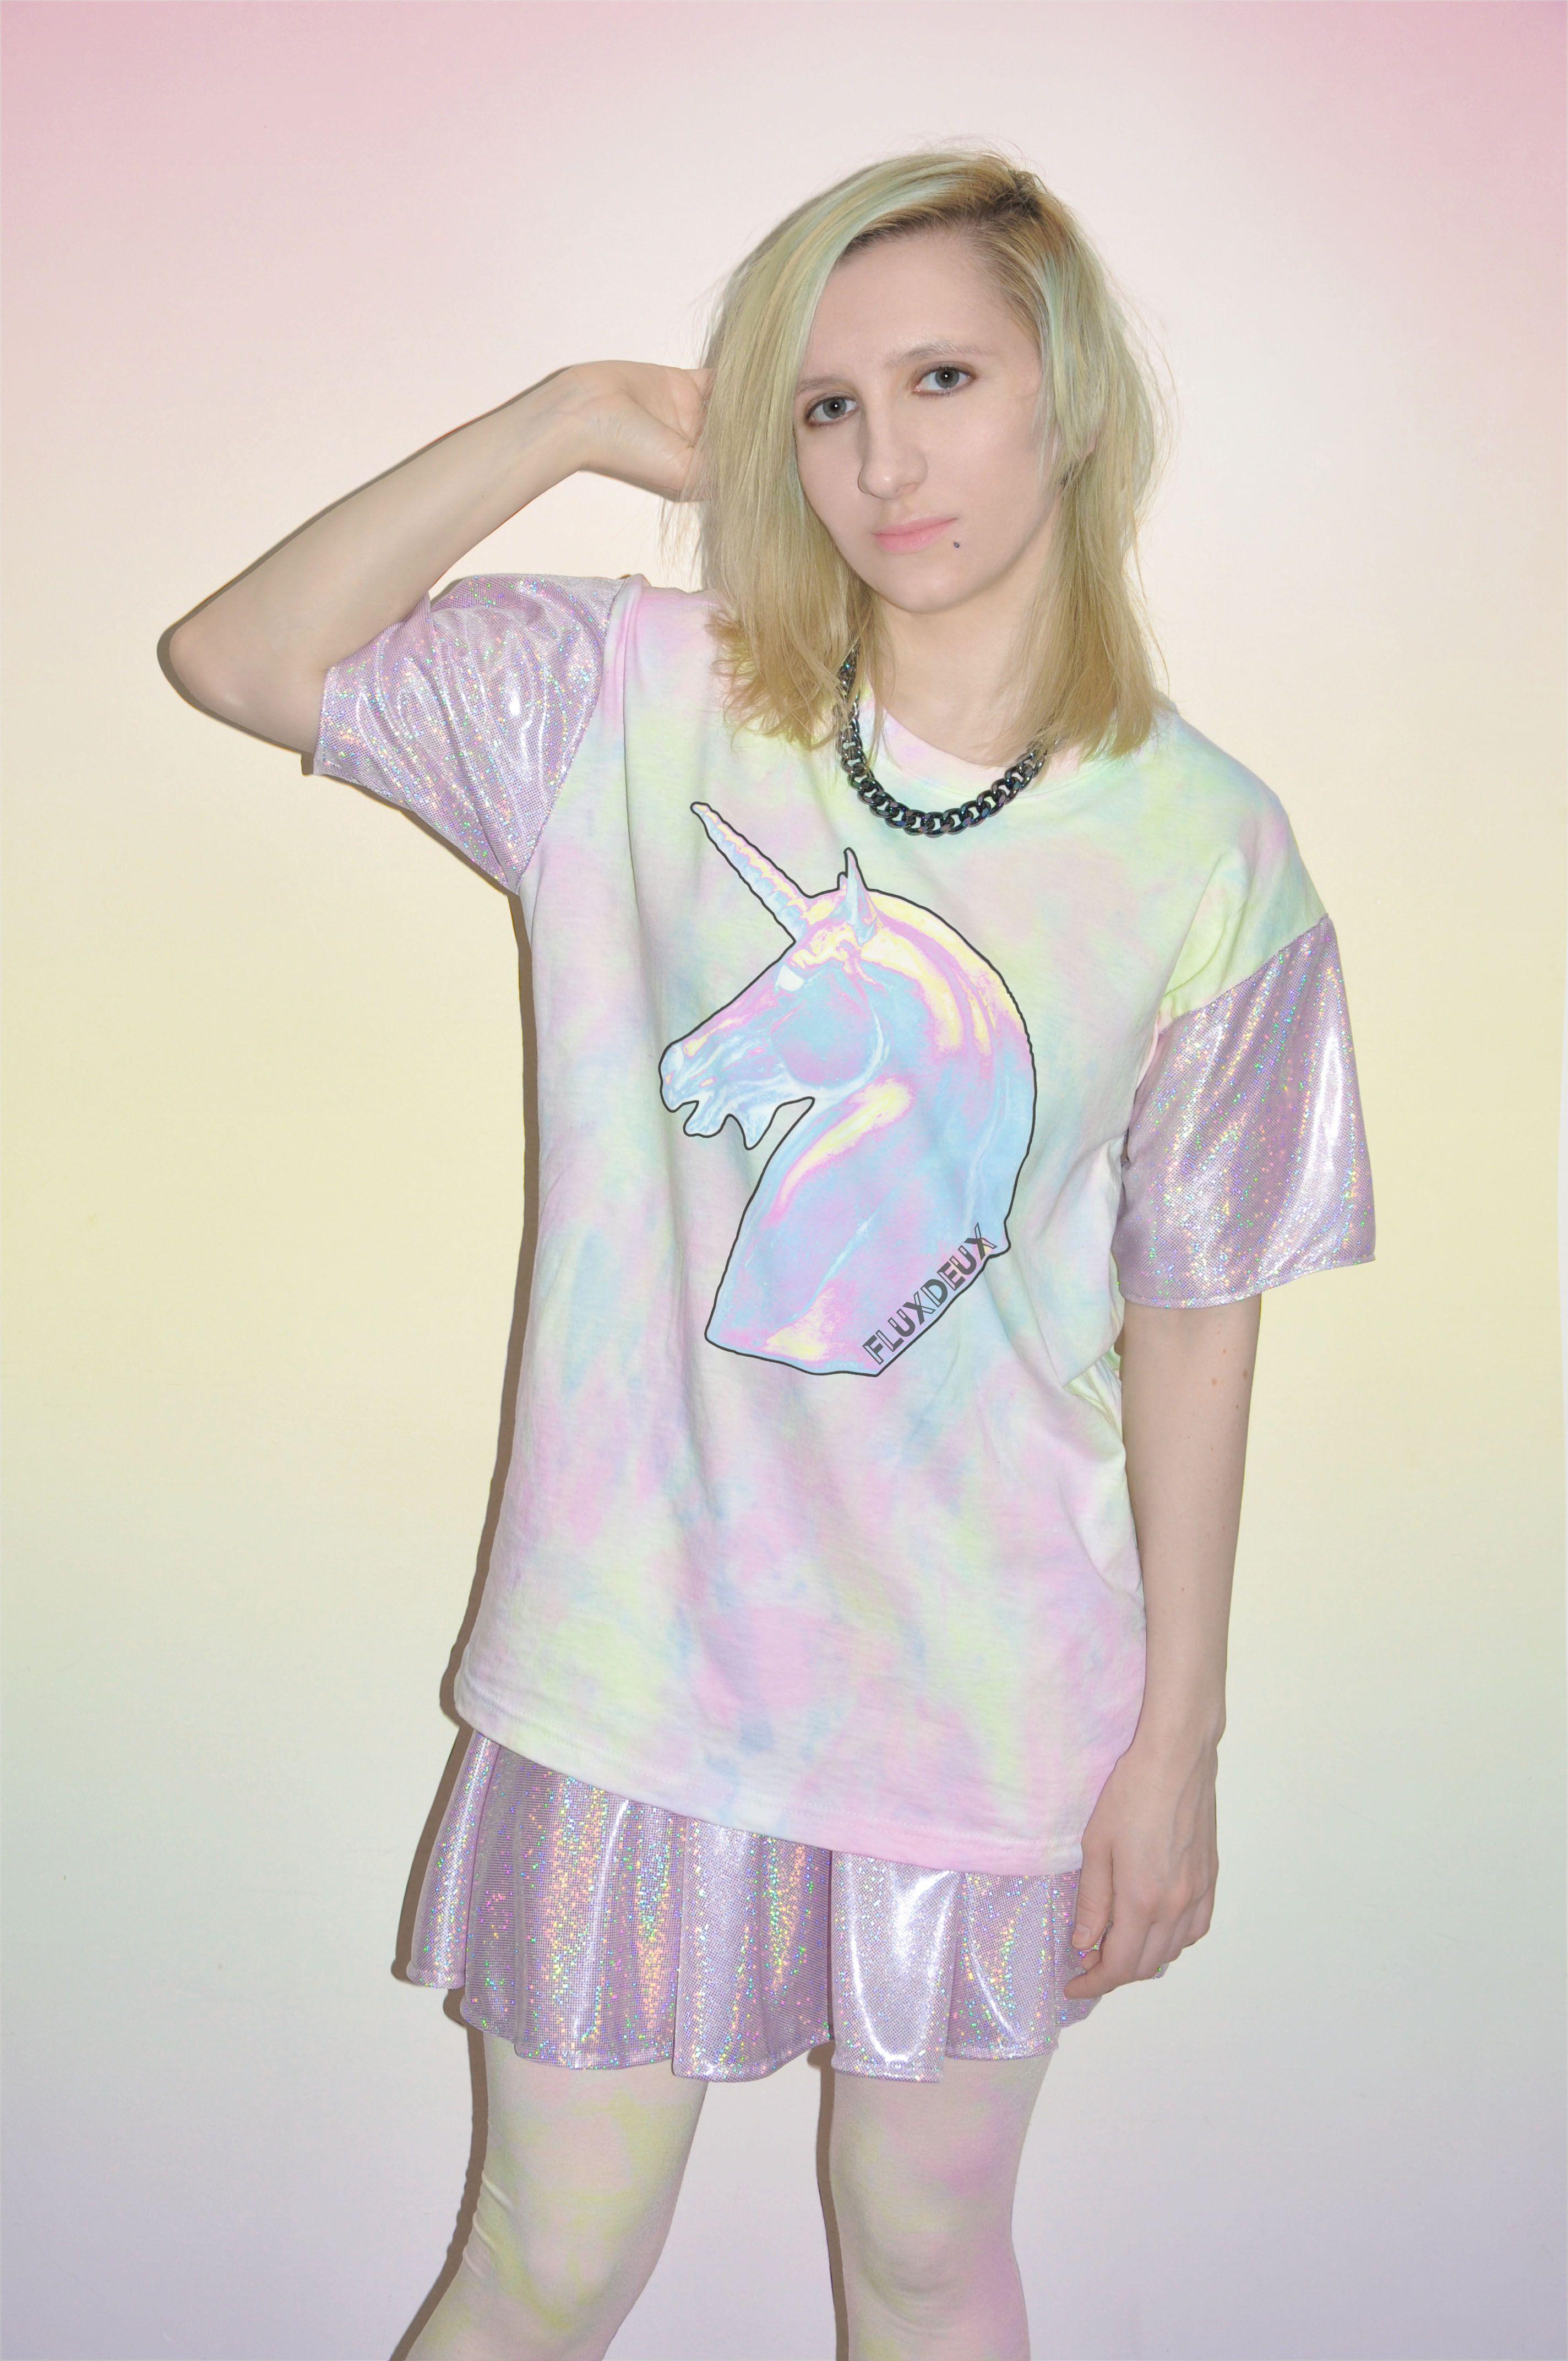 UNICORNS ARE REAL... YOU CAN GET YOURS HERE! #90s #90sfashion #grunge #pastelgrunge #pastelgoth #metallic #unicorn #ss14 #tiedye #kawaii